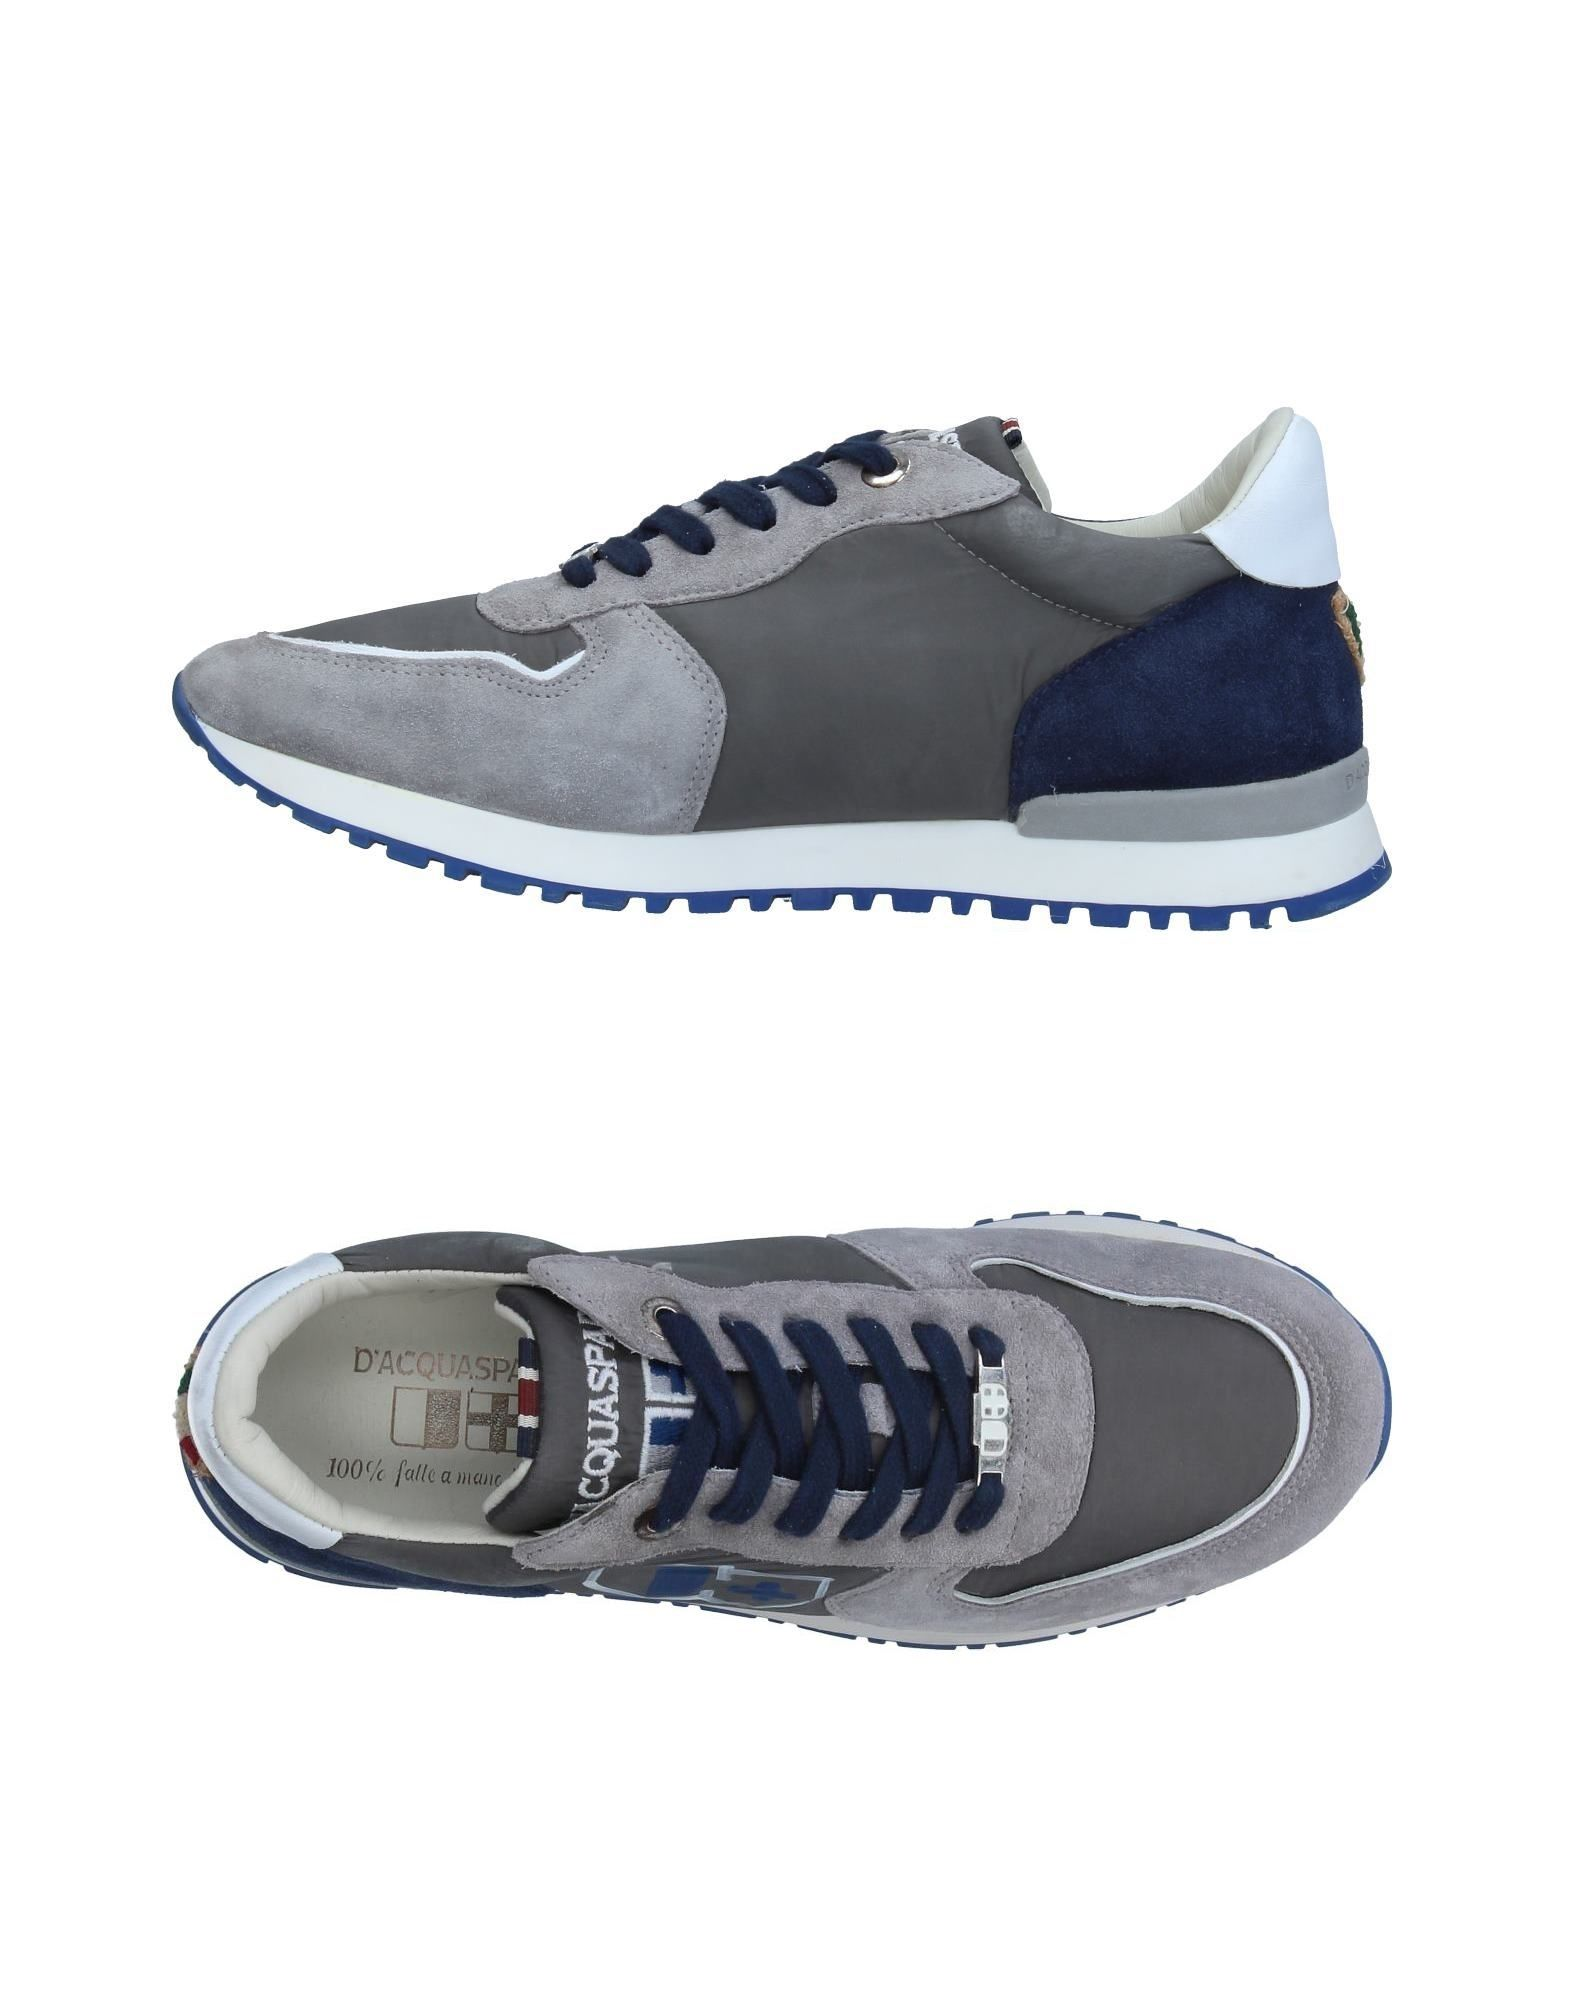 D'ACQUASPARTA Низкие кеды и кроссовки pierre hardy низкие кеды и кроссовки